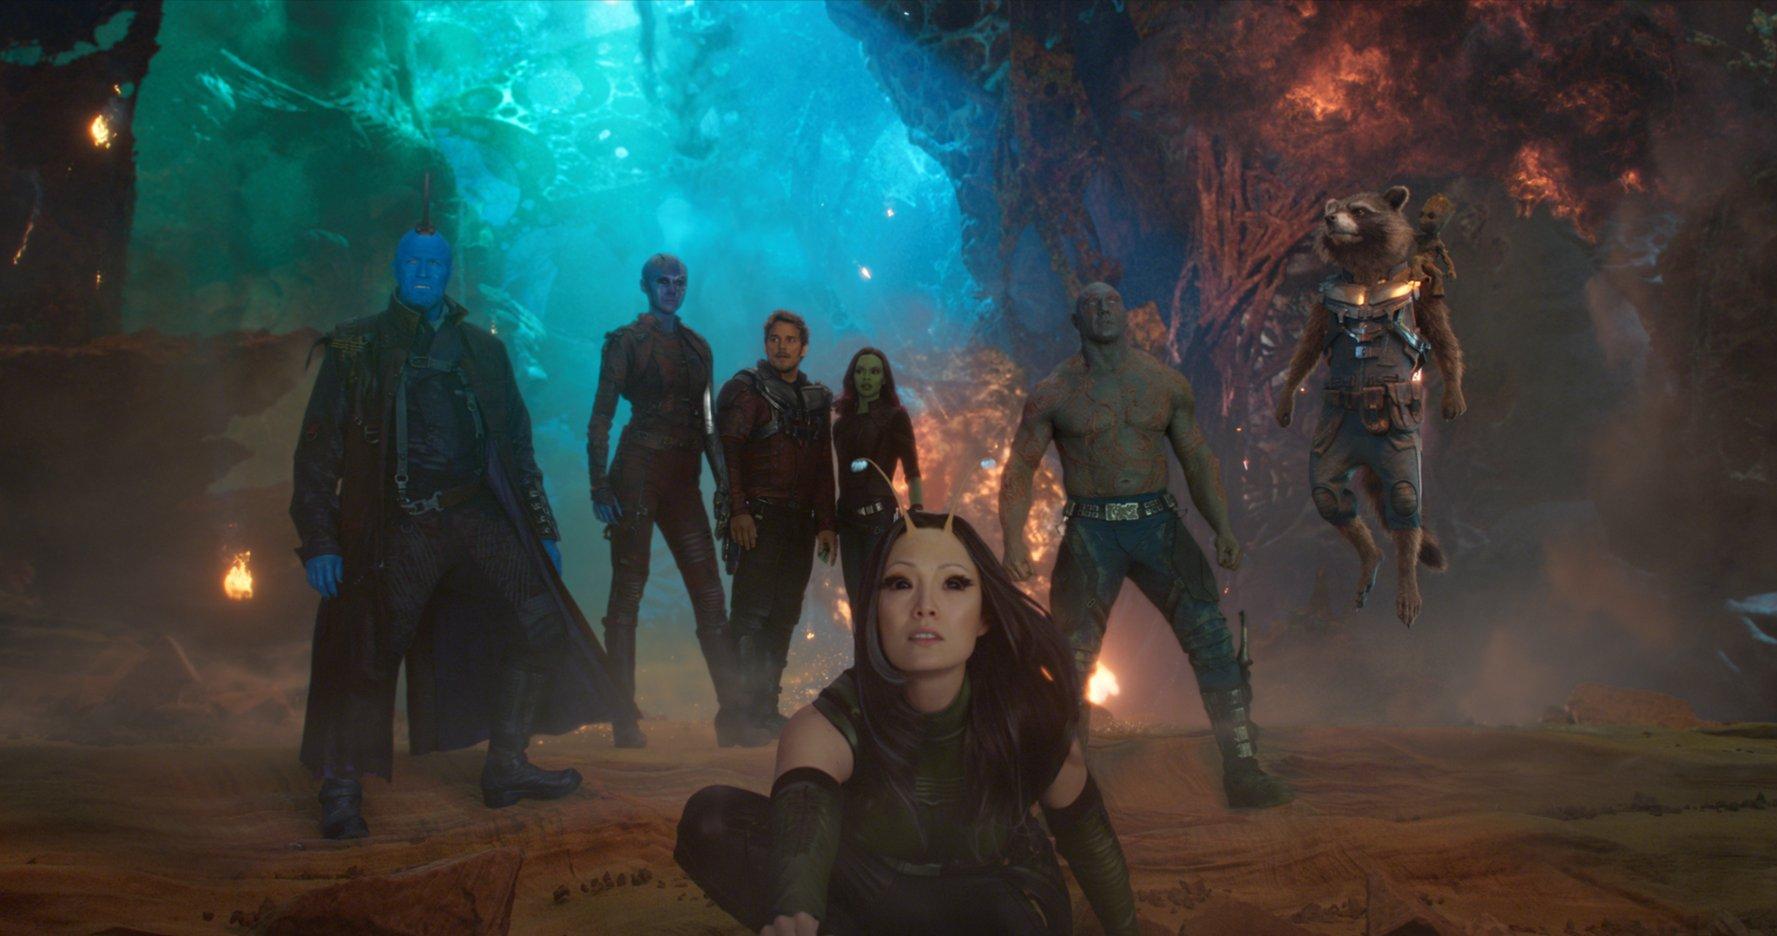 https://cinemaplanet.pt/wp-content/uploads/2017/04/guardians-of-the-galaxy-vol-2.jpg